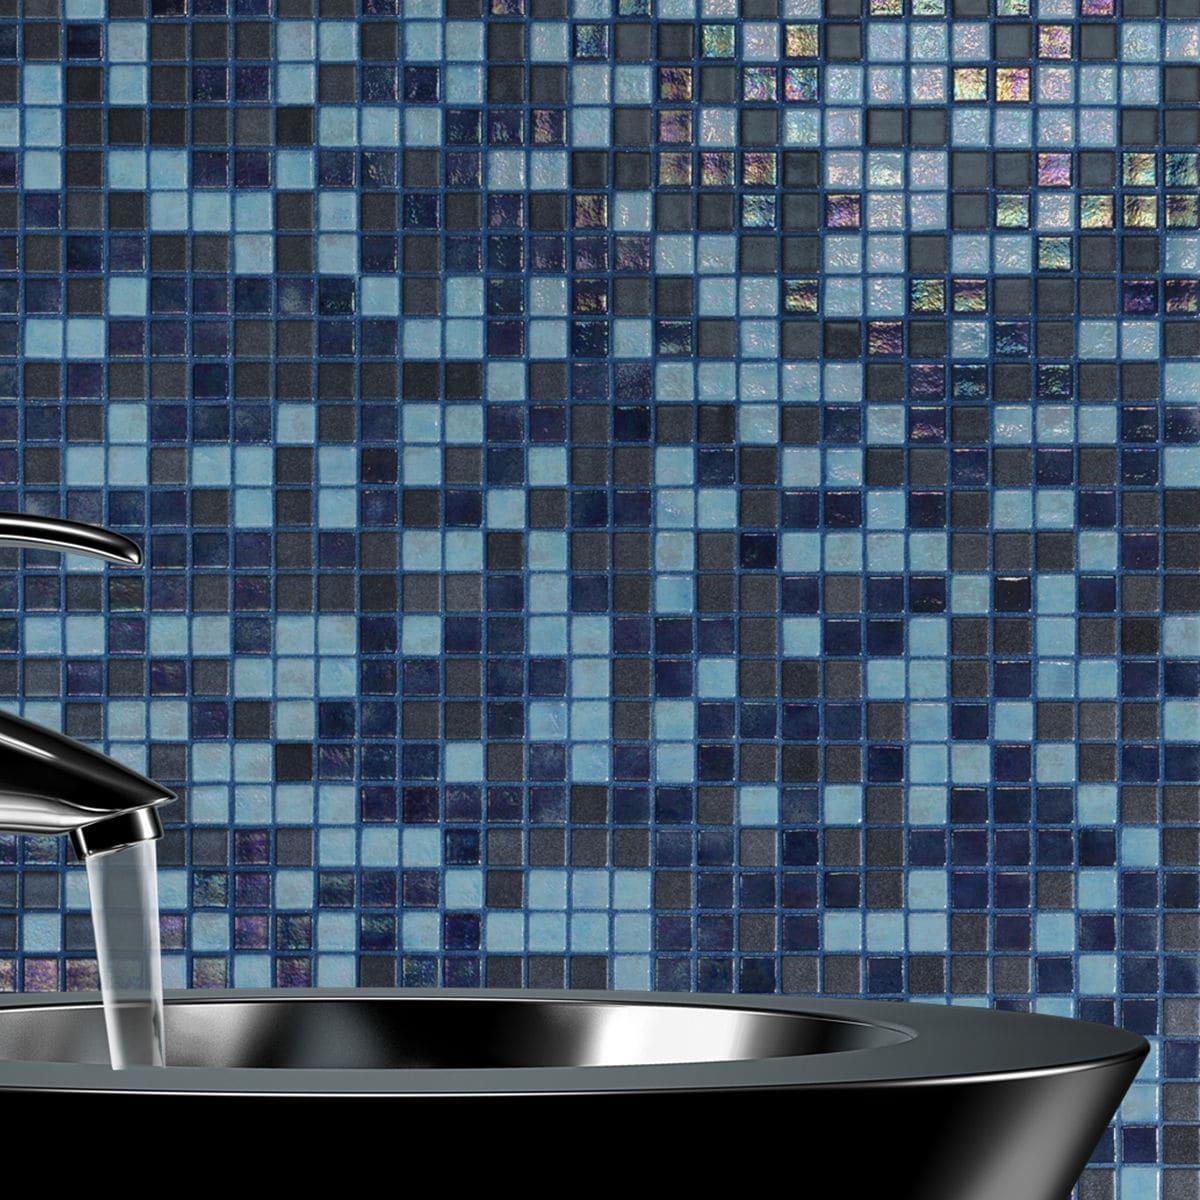 Mosaique De Salle De Bain Blue Lagoon Ezarri Pour Sauna De